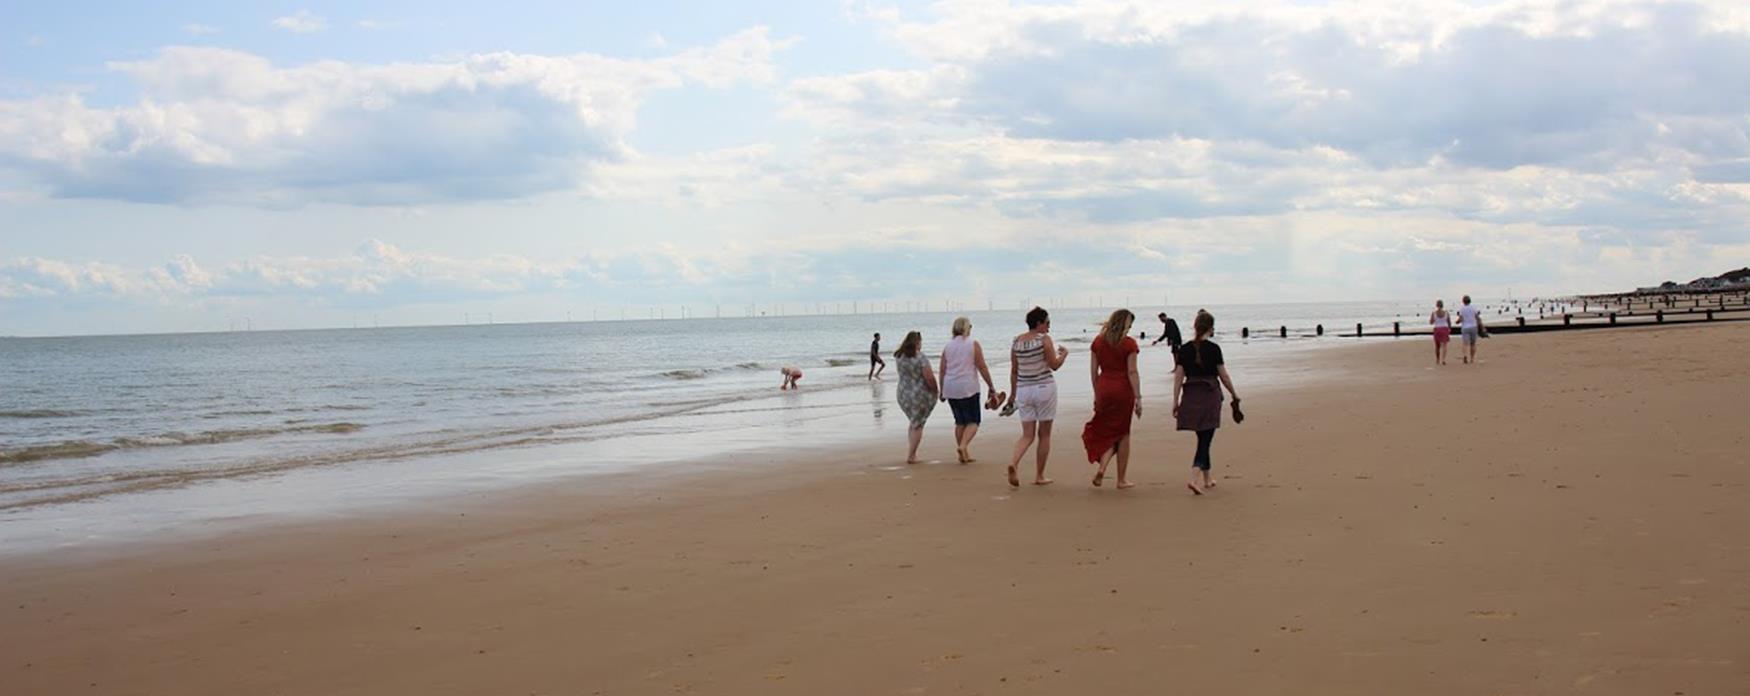 A group of people walking along Frinton-On-Sea beach